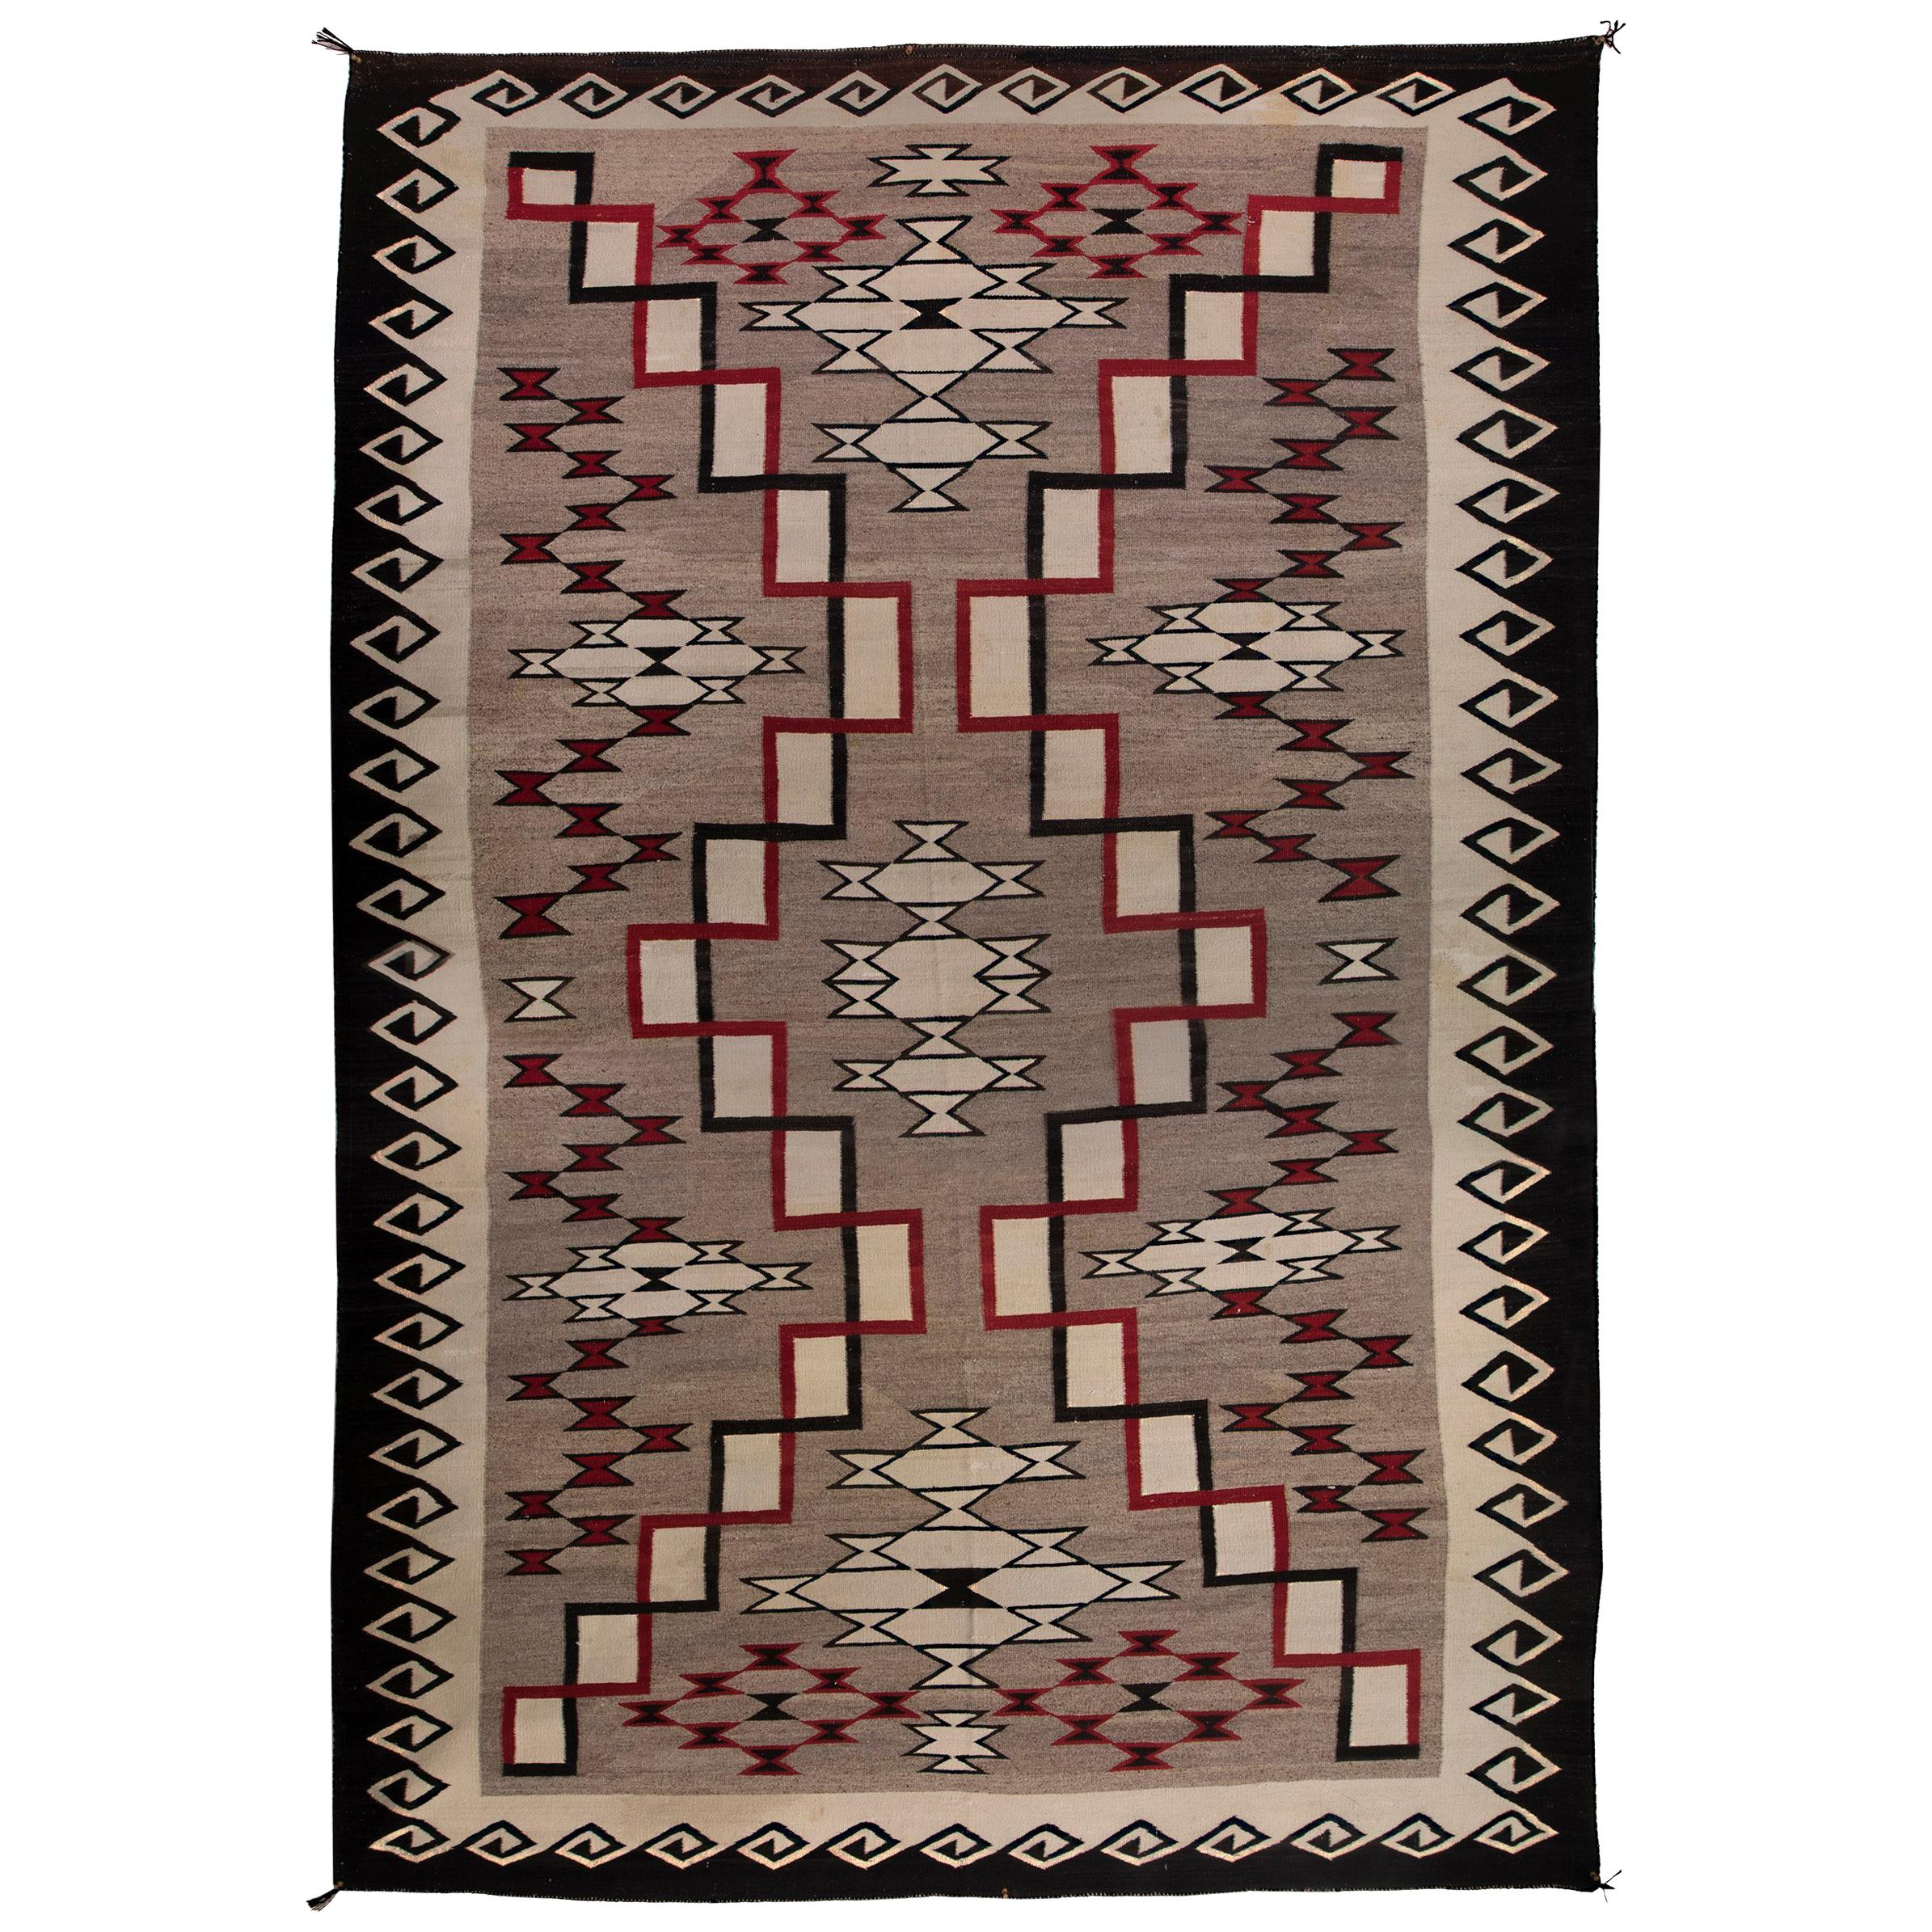 Navajo rug designs for kids Recognize Indigenous Vintage Navajo Rug Ganado Trading Post Early 20th Century For Sale 1stdibs Vintage Navajo Rug Ganado Trading Post Early 20th Century For Sale